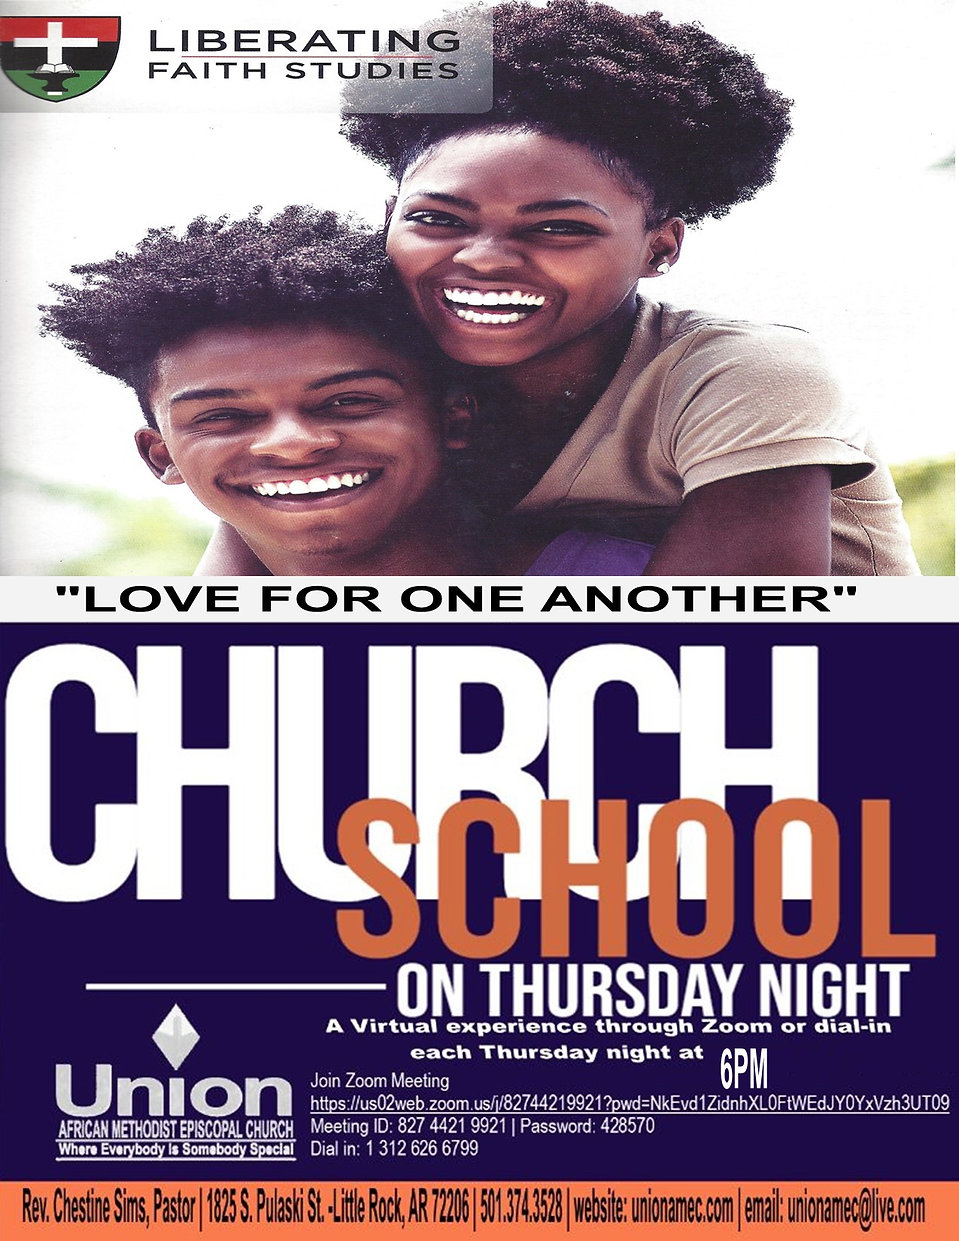 CHURCH SCHOOL fall quater.jpg